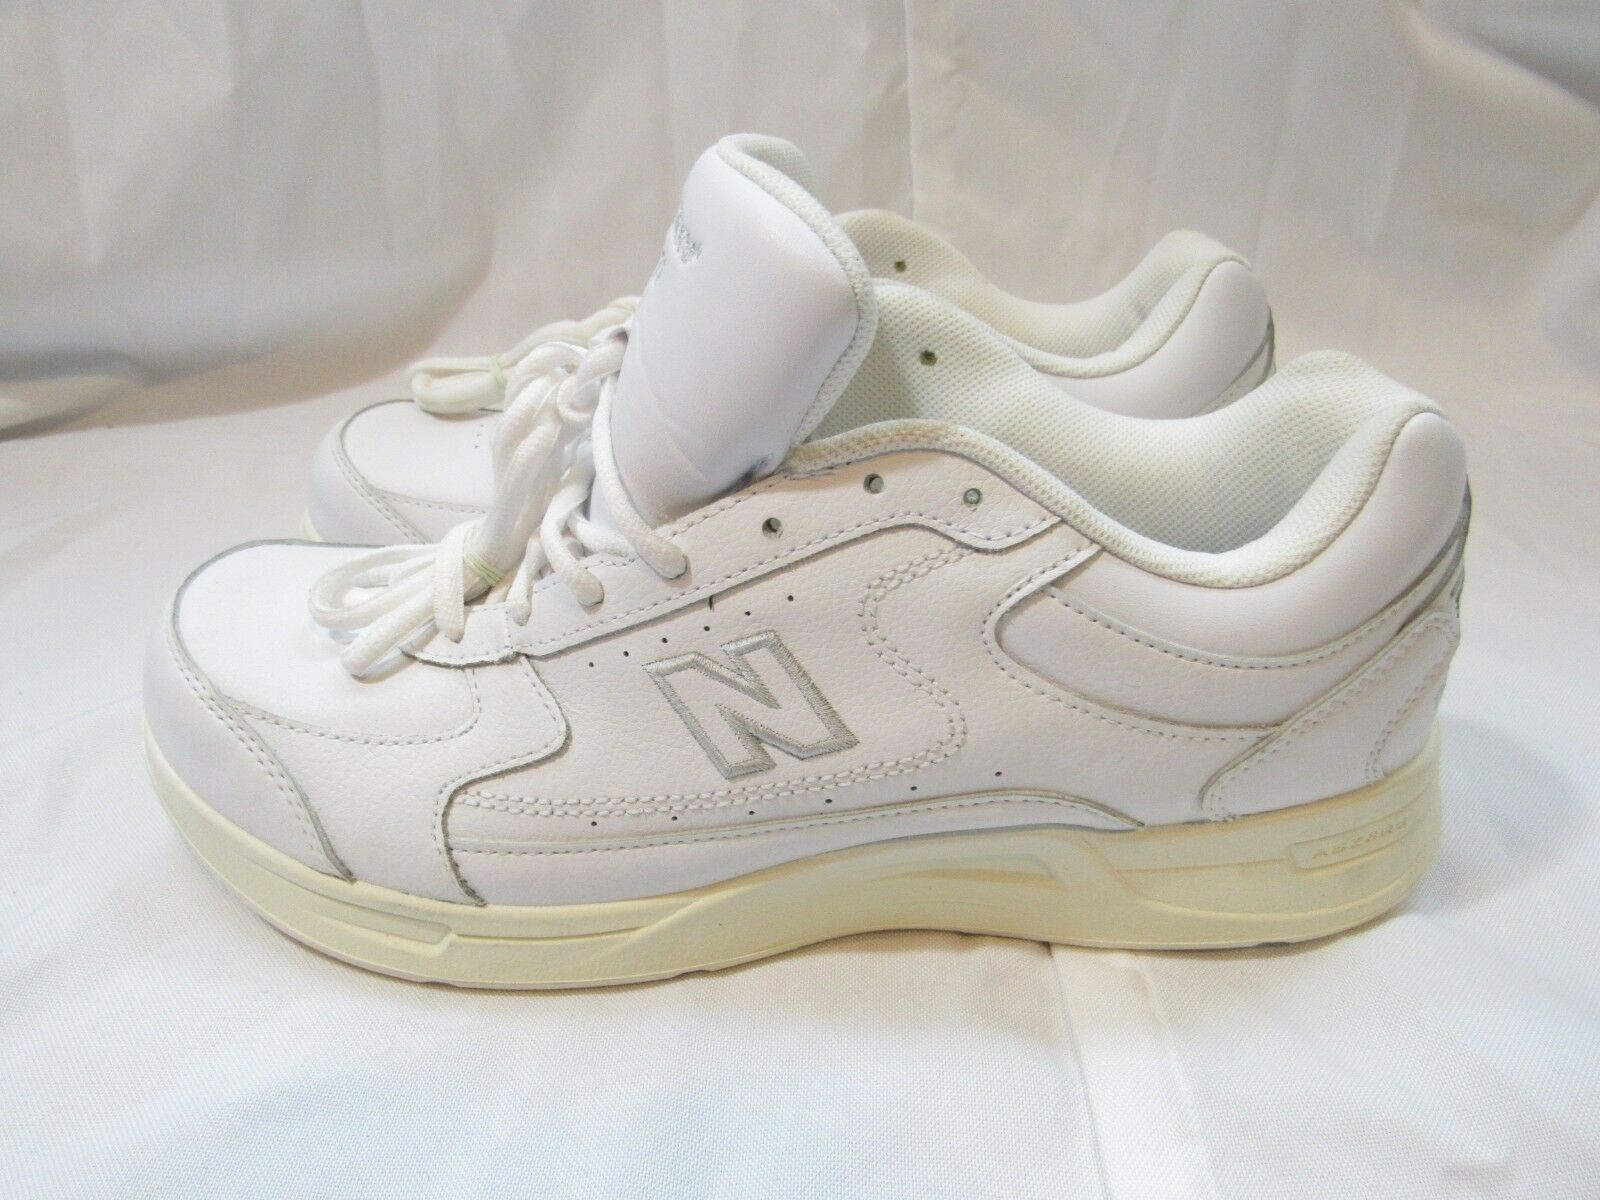 New balance MW576WT Caminar Hombre Zapatos  Para Caminar MW576WT D 10.5 DSL2 Blanco Nuevo 37ec6a